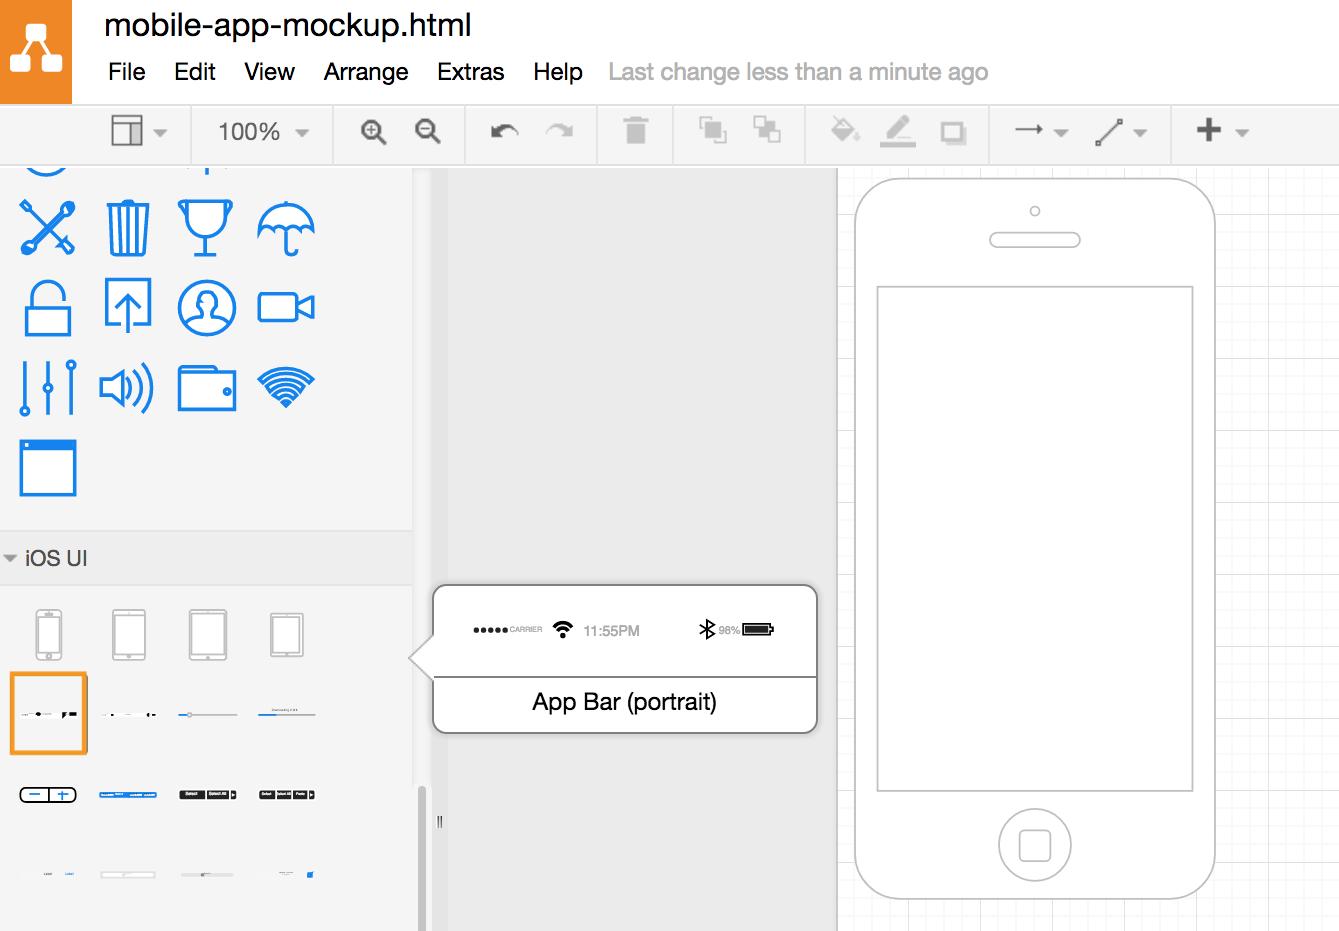 draw.io-将应用程序栏添加到iPhone轮廓